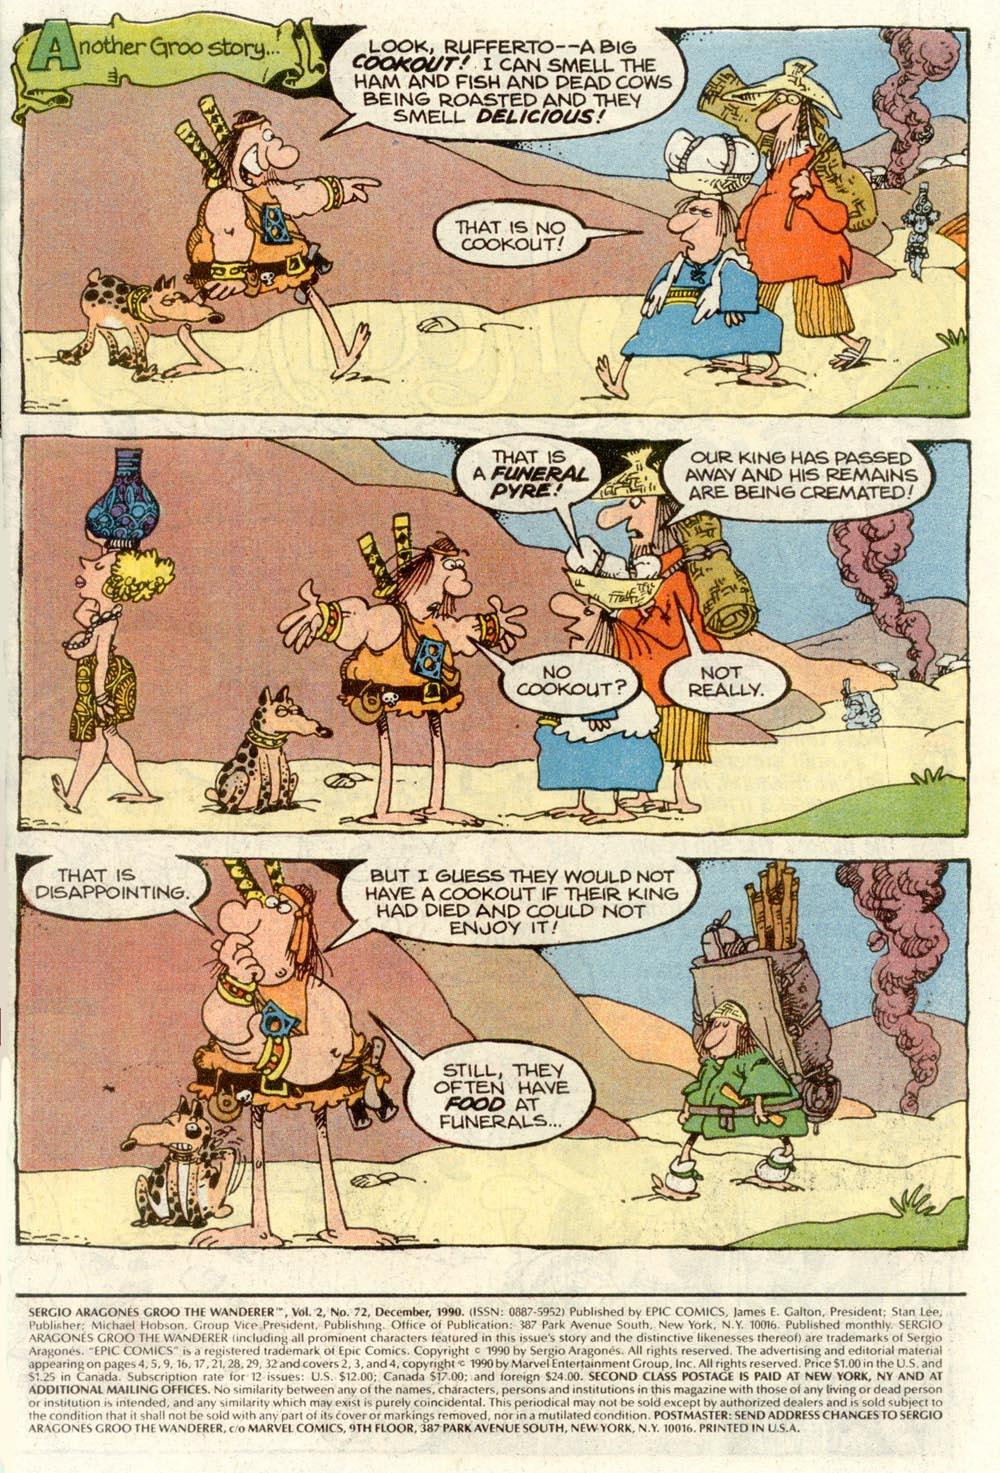 Read online Sergio Aragonés Groo the Wanderer comic -  Issue #72 - 2